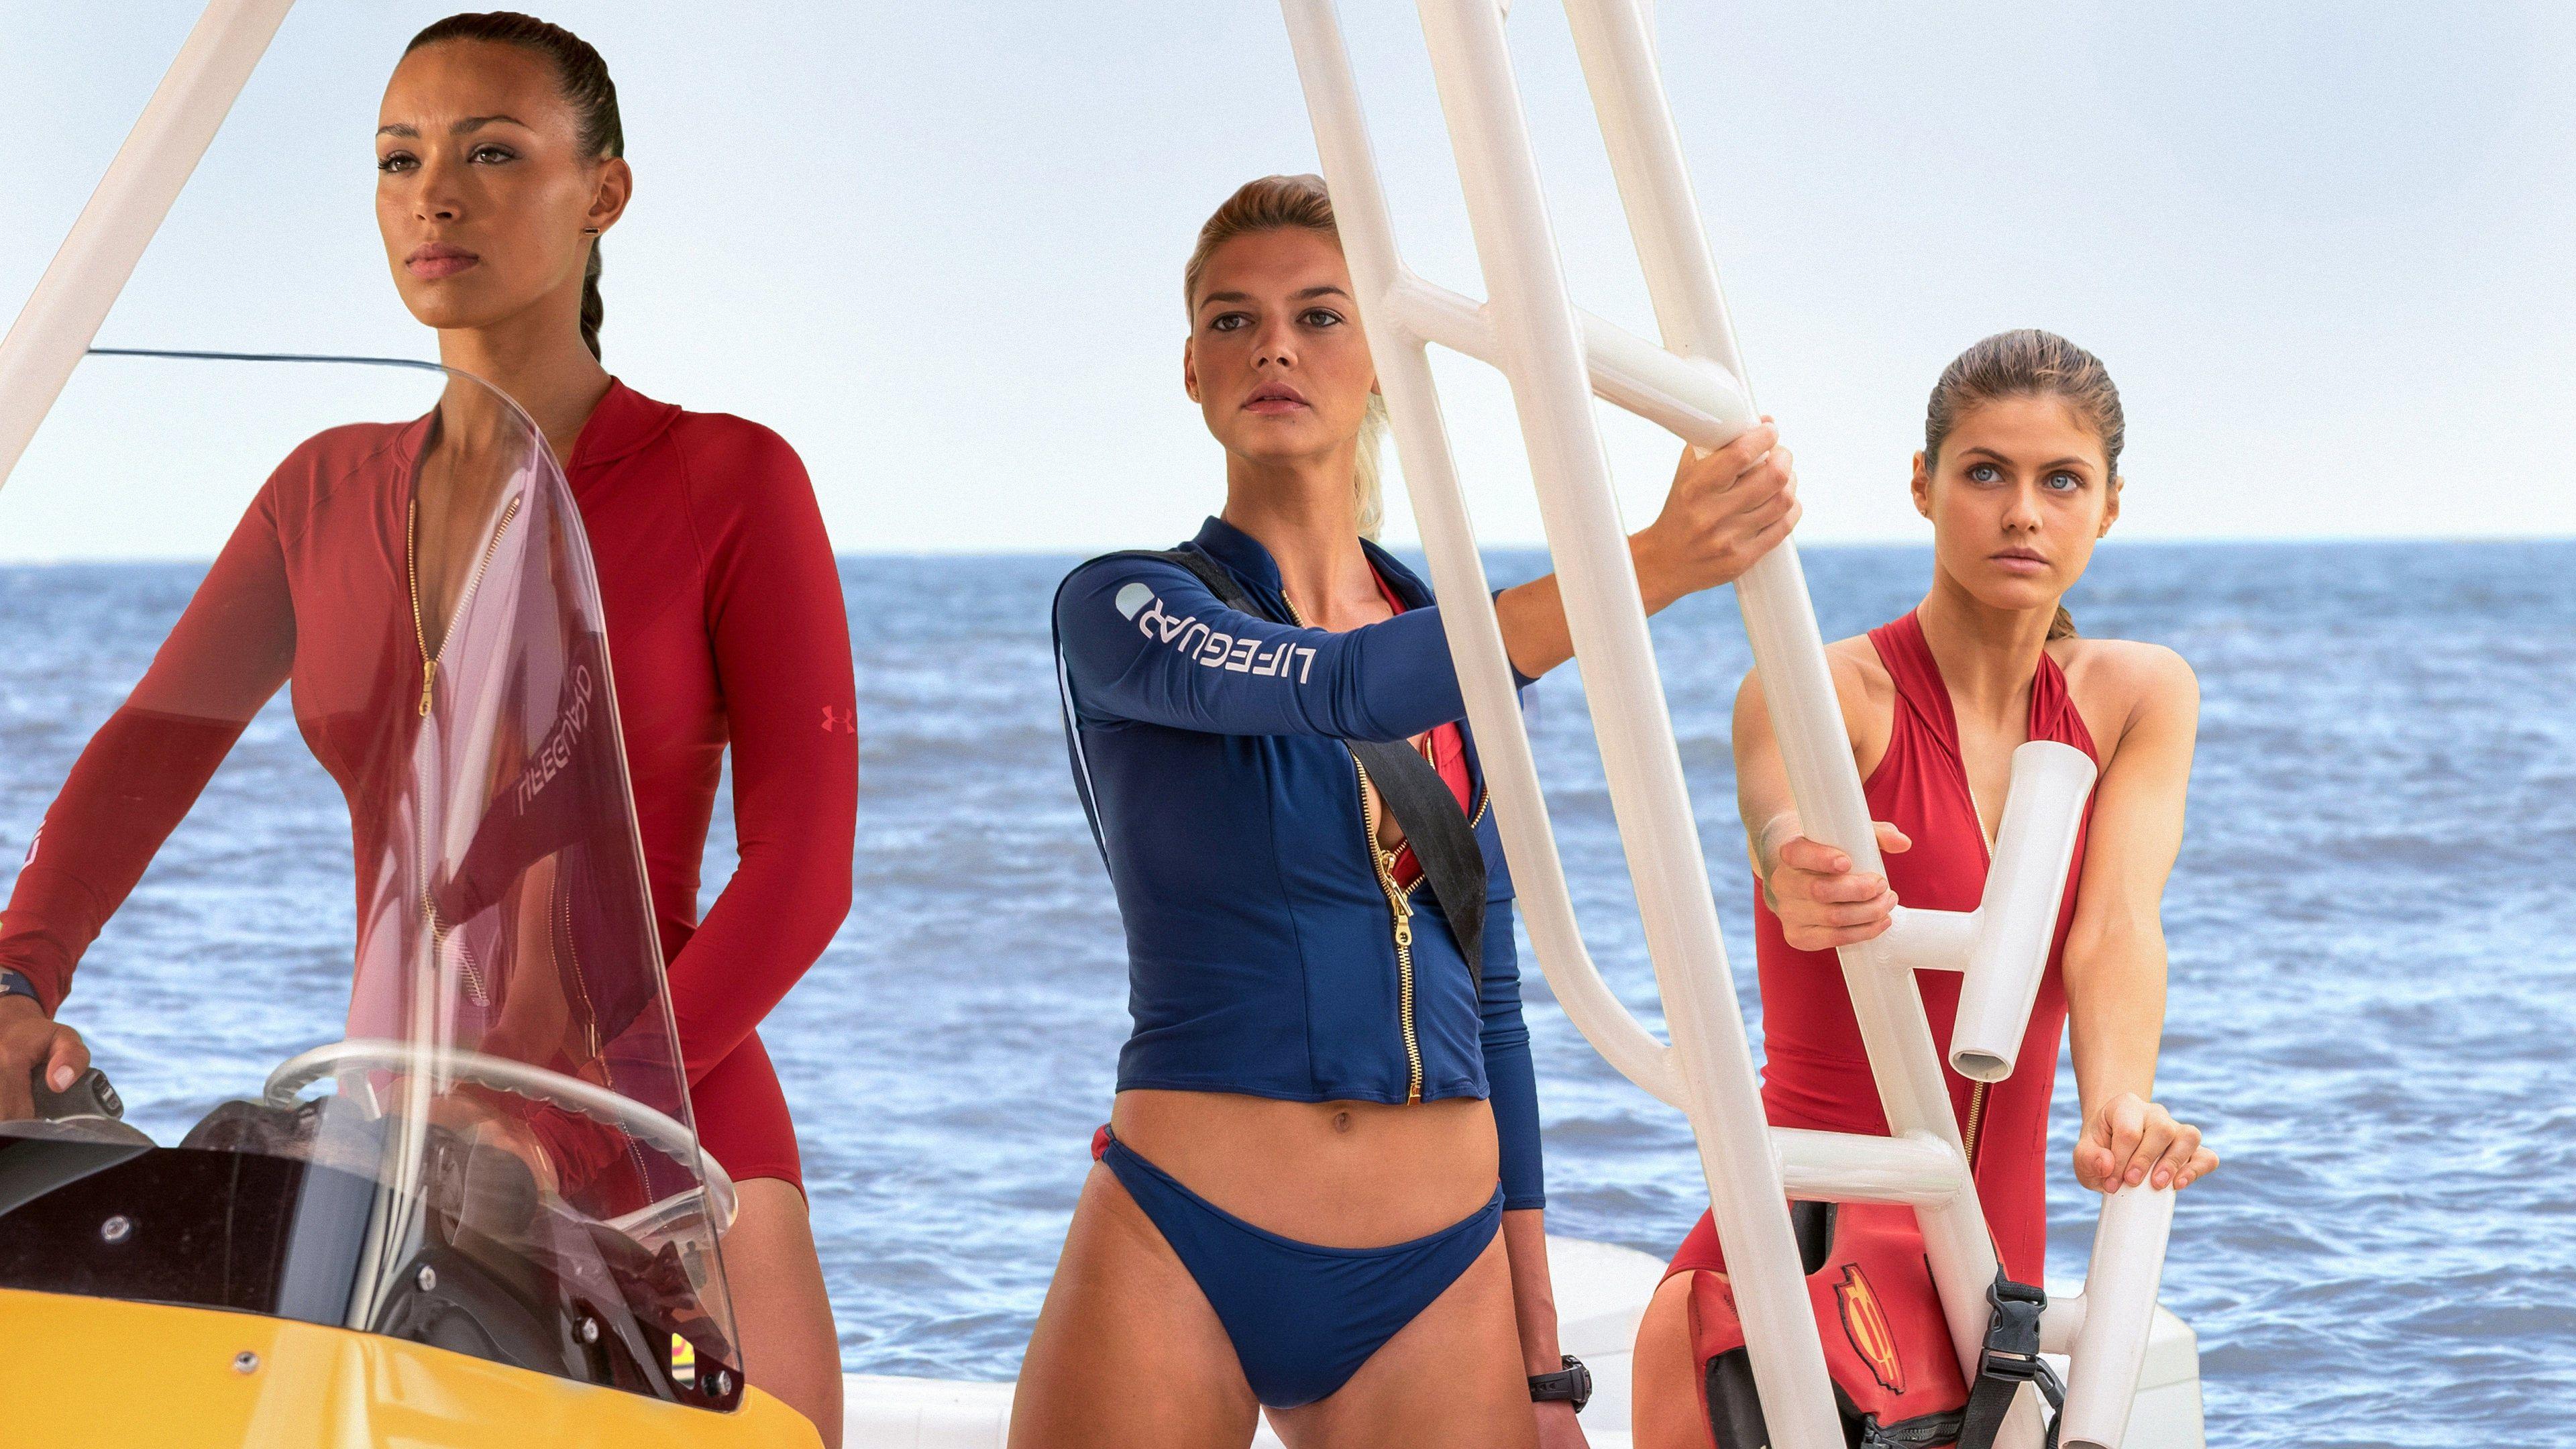 Baywatch 2017 Online Teljes Film Filmek Magyarul Letoltes Hd A Nagysikeru Tevesorozat Moziverziojaban Az Alexandra Daddario Alexandra Daddario Bikini Baywatch